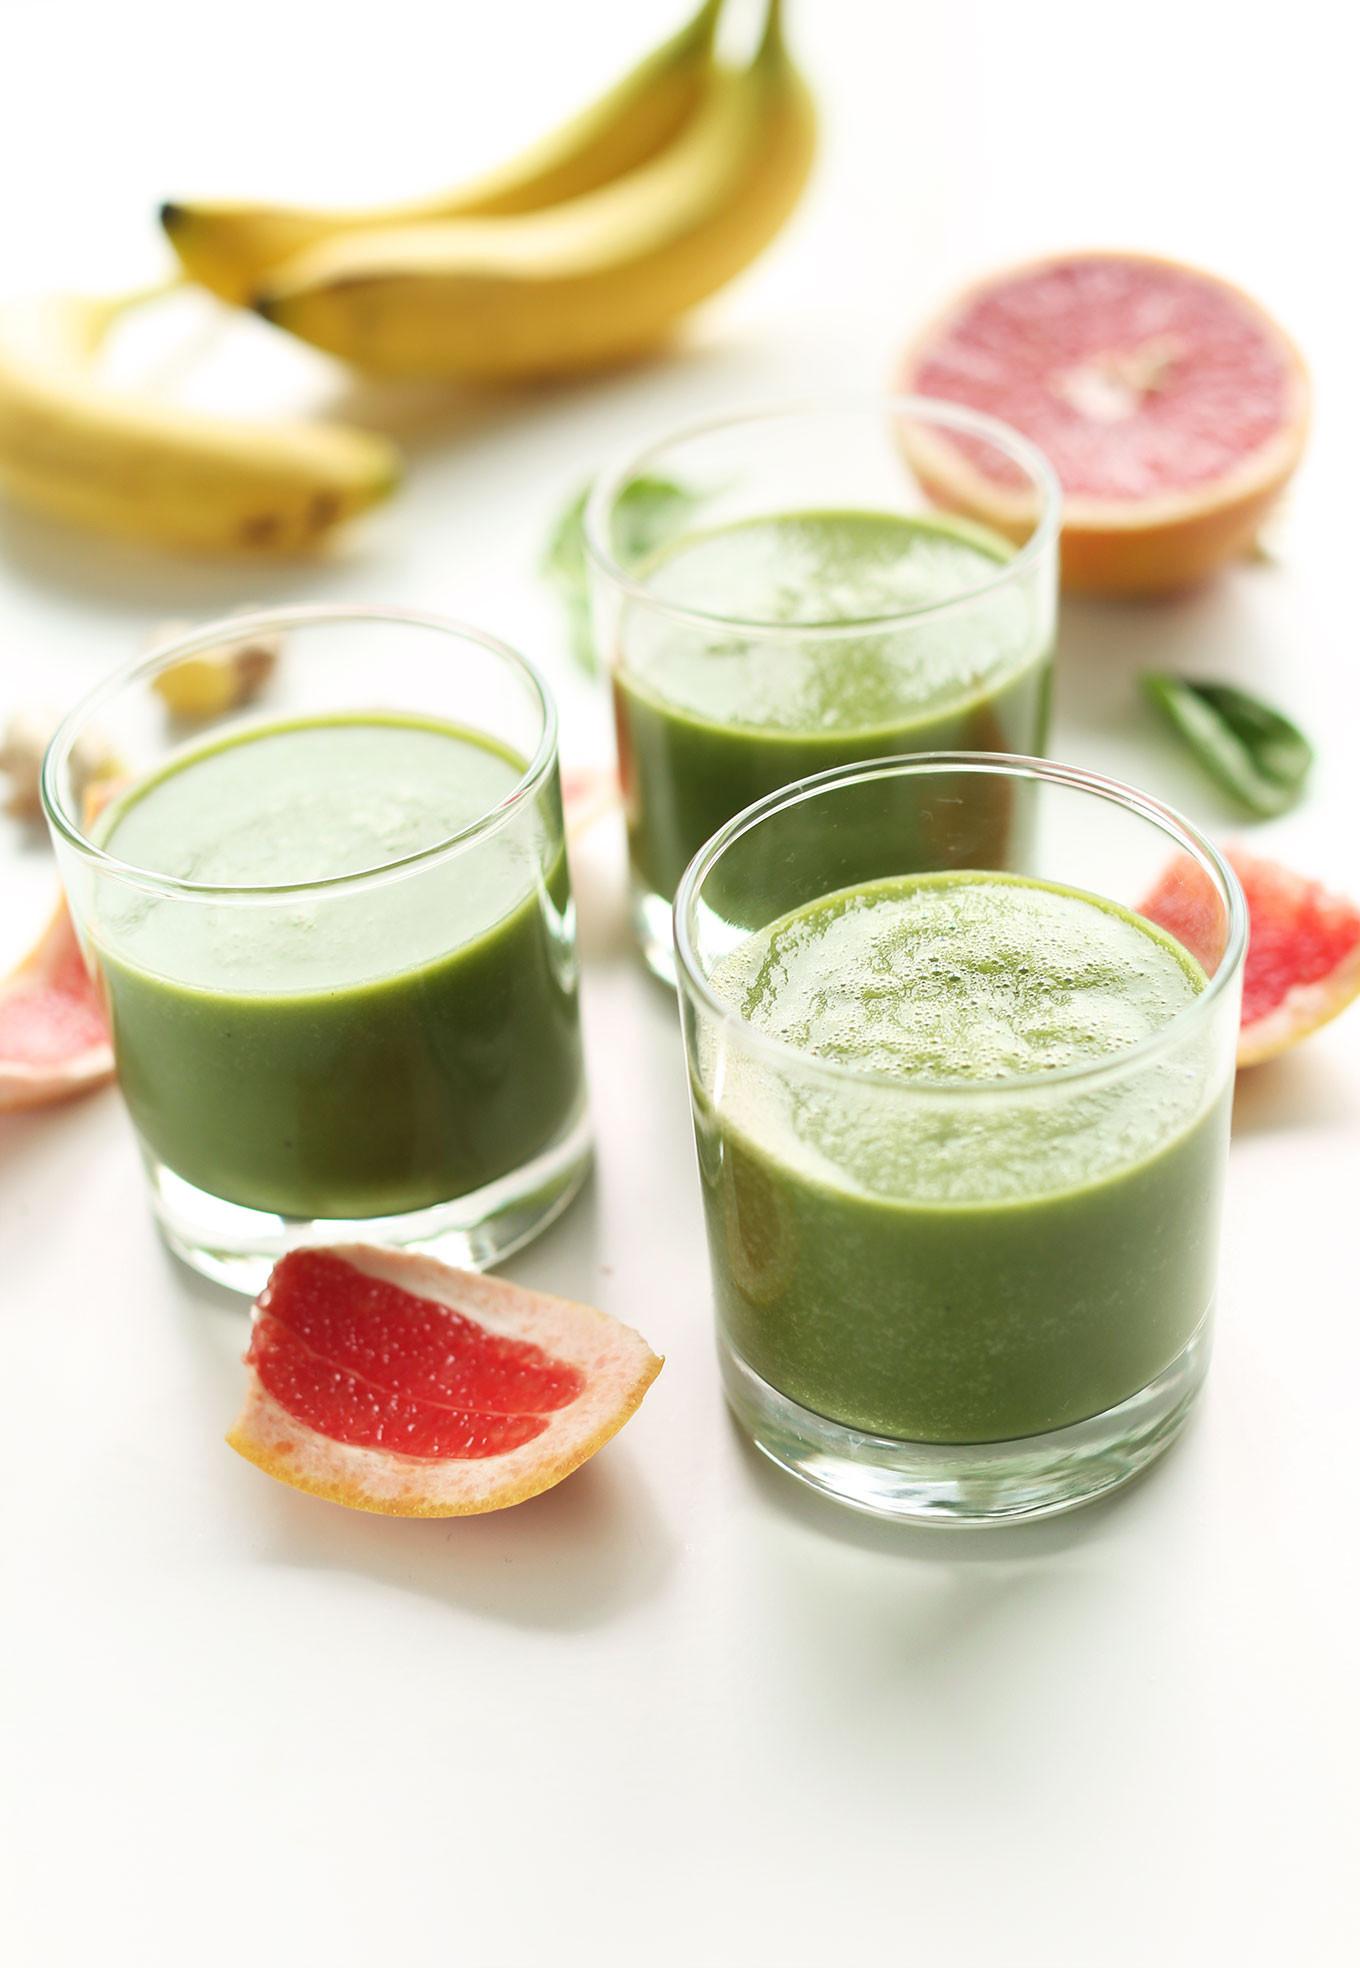 Healthy Vegan Smoothies  6 Ingre nt Grapefruit Green Smoothie vegan glutenfree